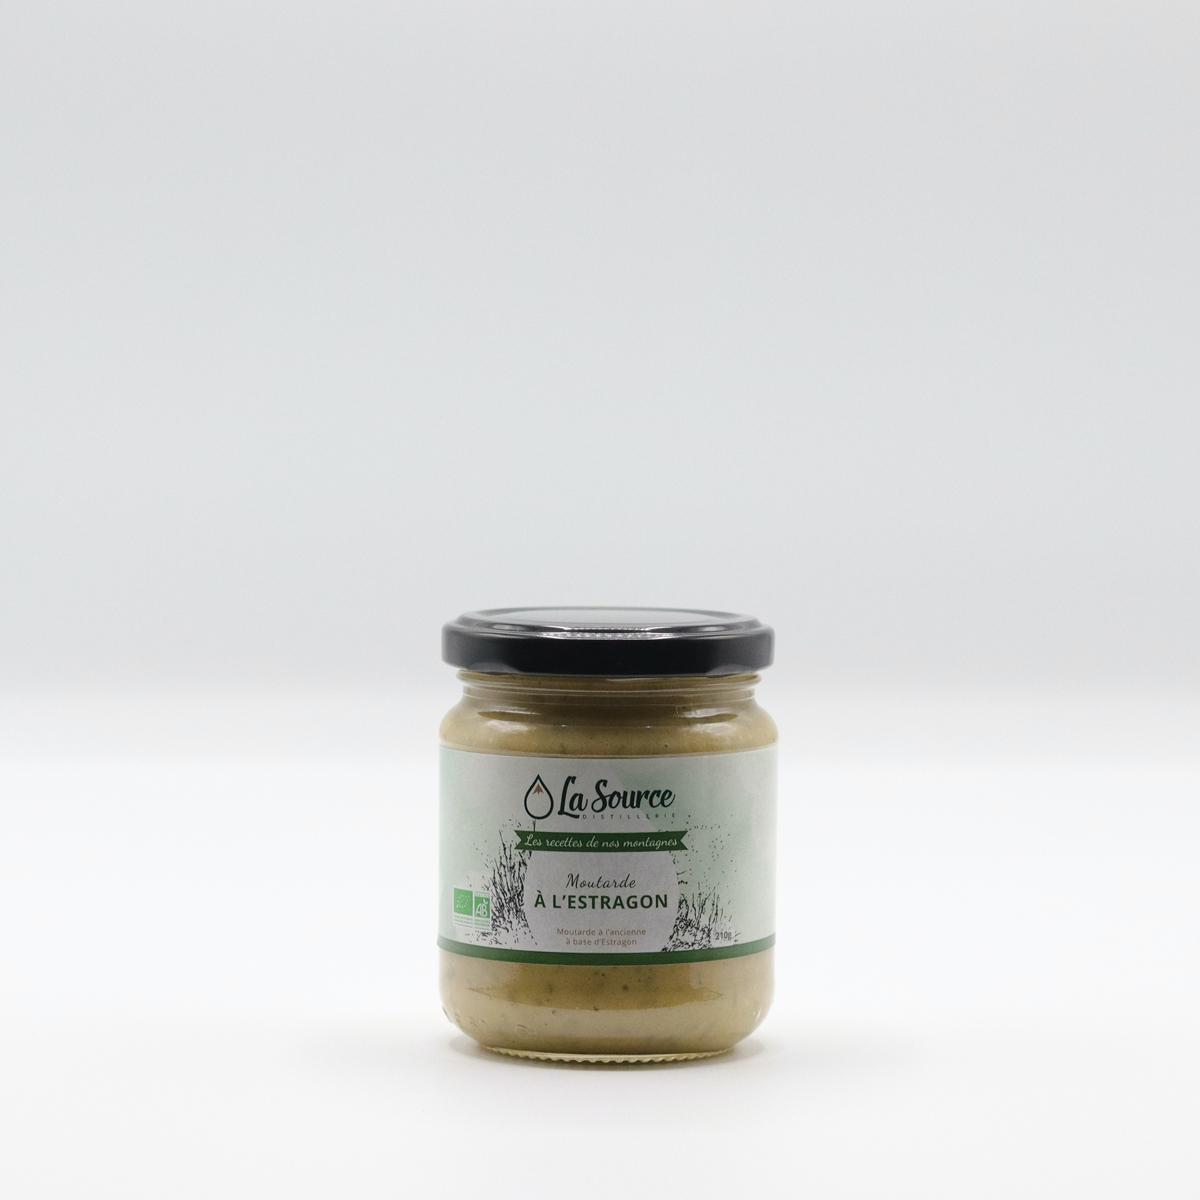 https://www.lasource-distillerie.fr/wp-content/uploads/2021/09/moutarde-a-lestragon.jpg